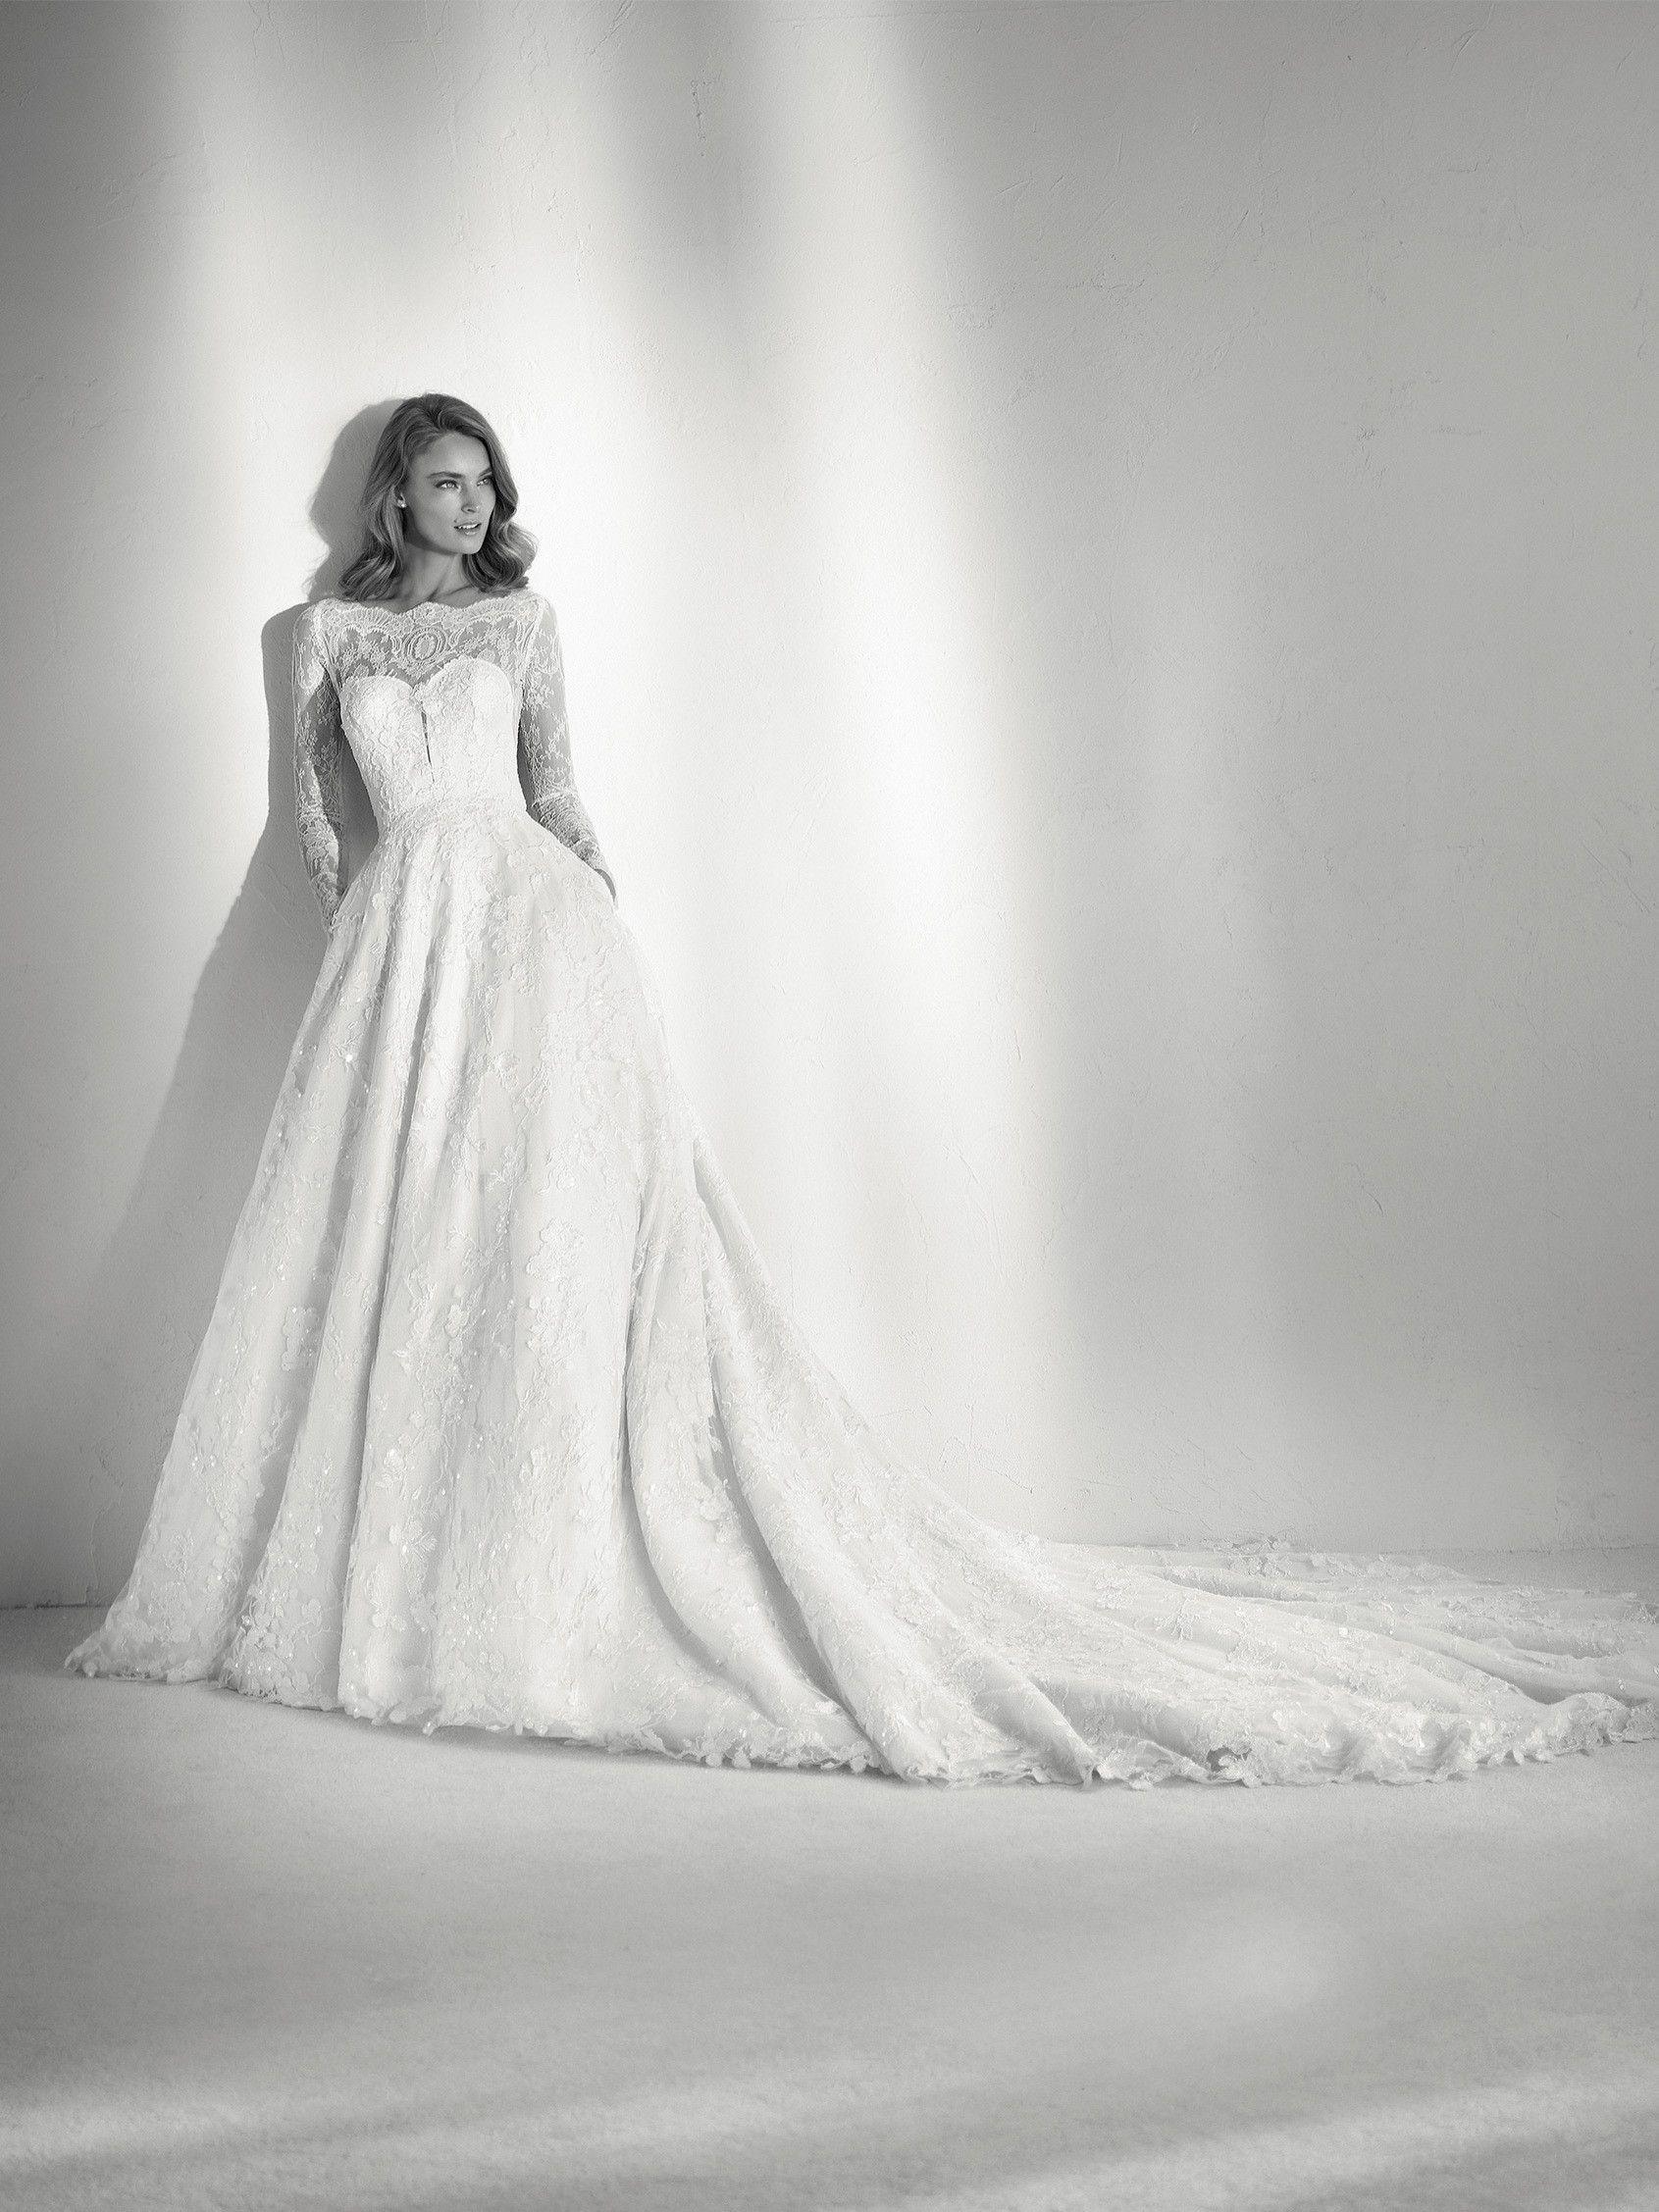 Wedding dress ballgown illusions - Pronovias 2018 Collection ...